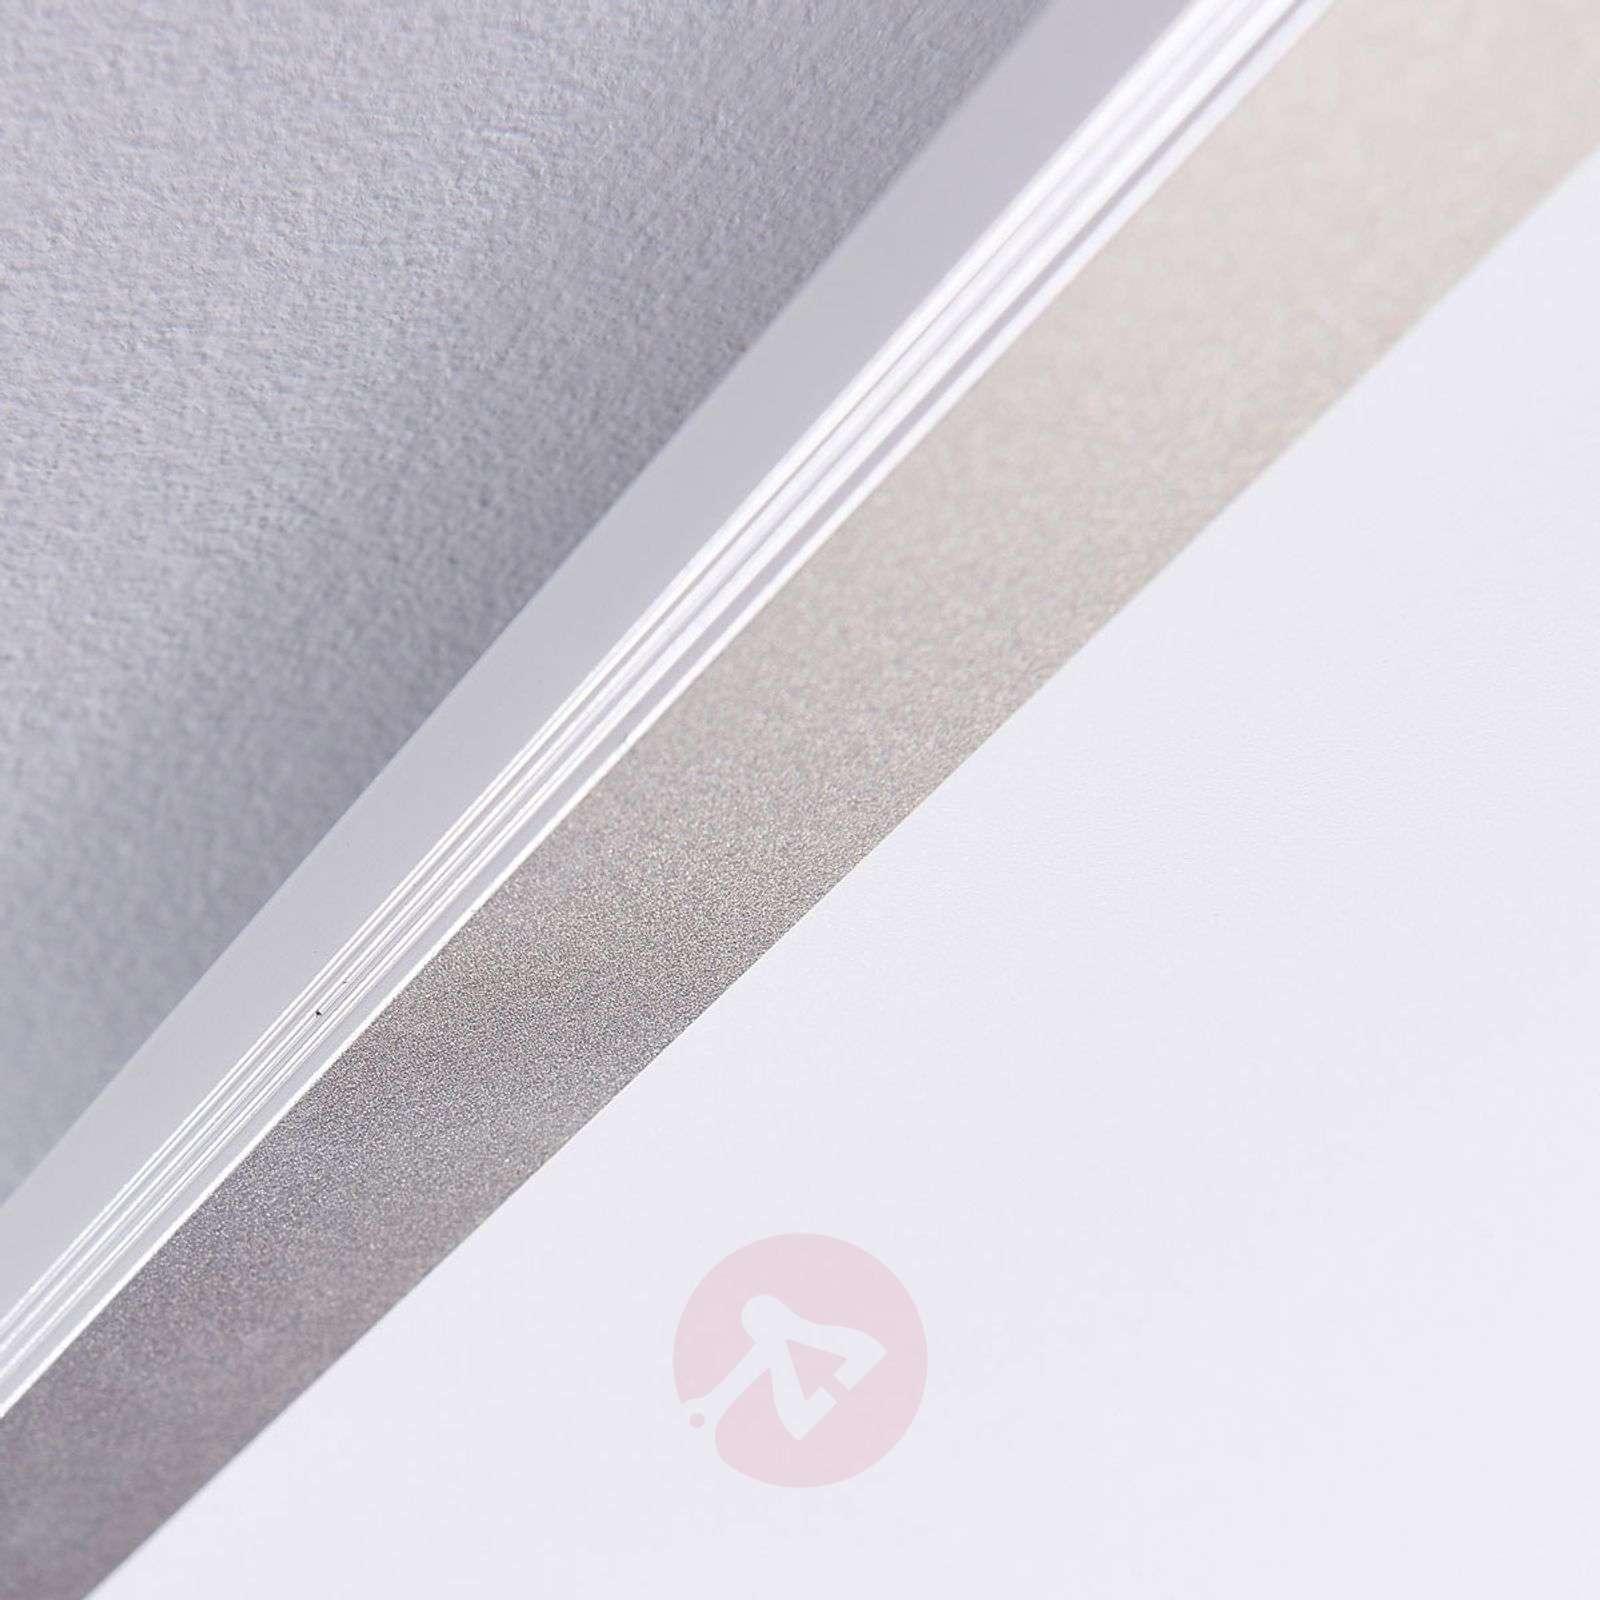 LED panel Liv, adjustable/dimmable luminous colour-9956005-02